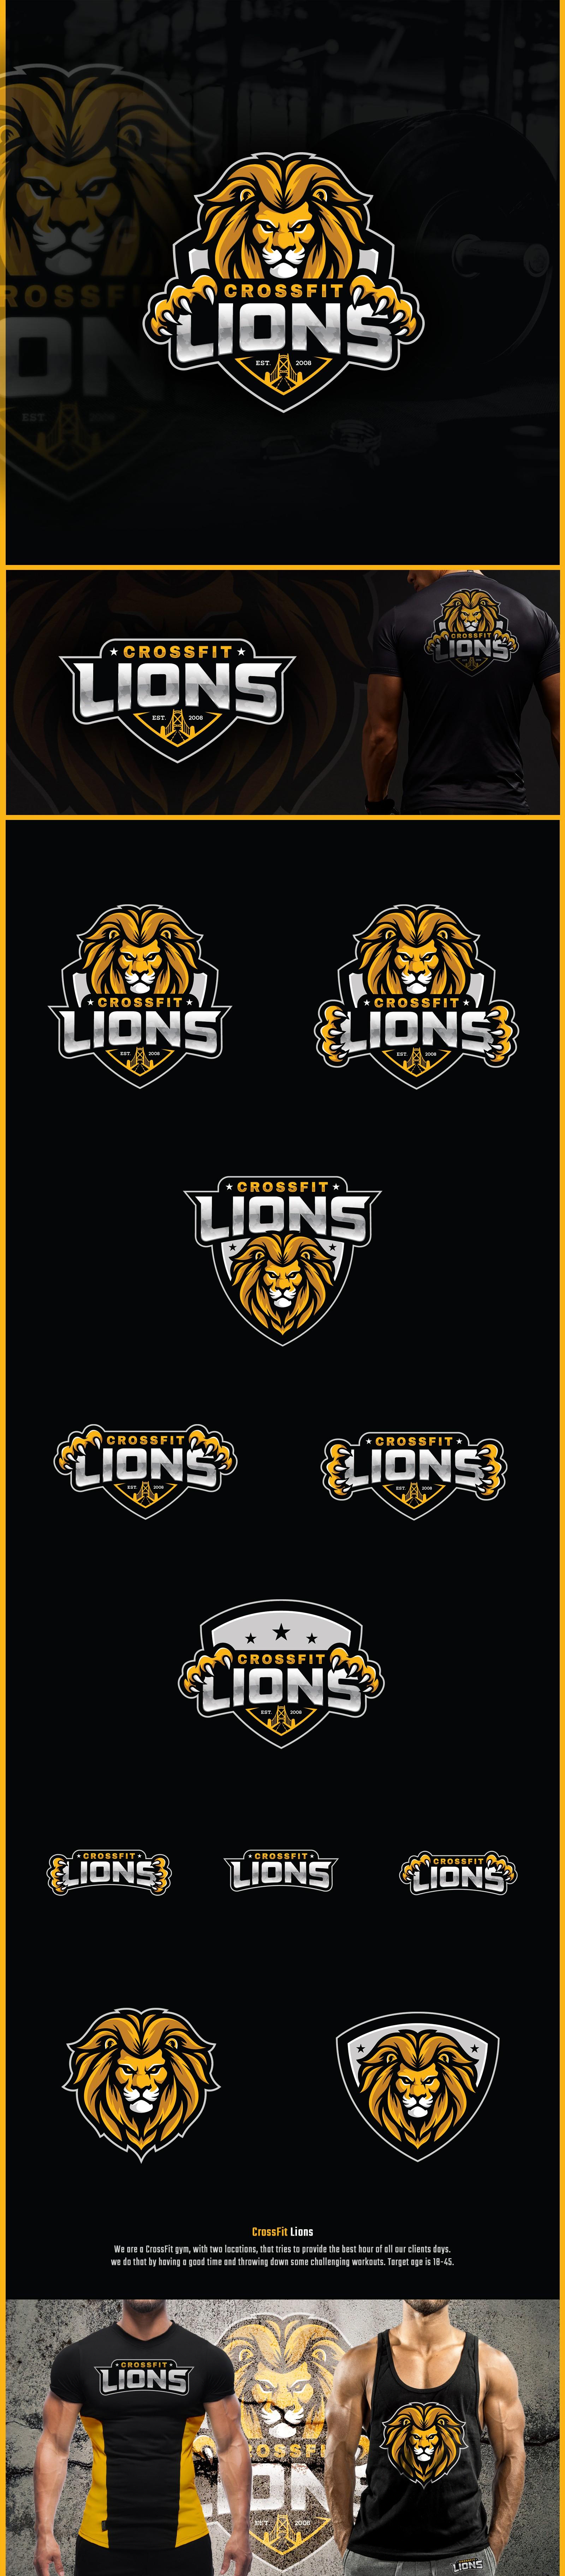 CrossFit Lions Needs A Fresh New Logo